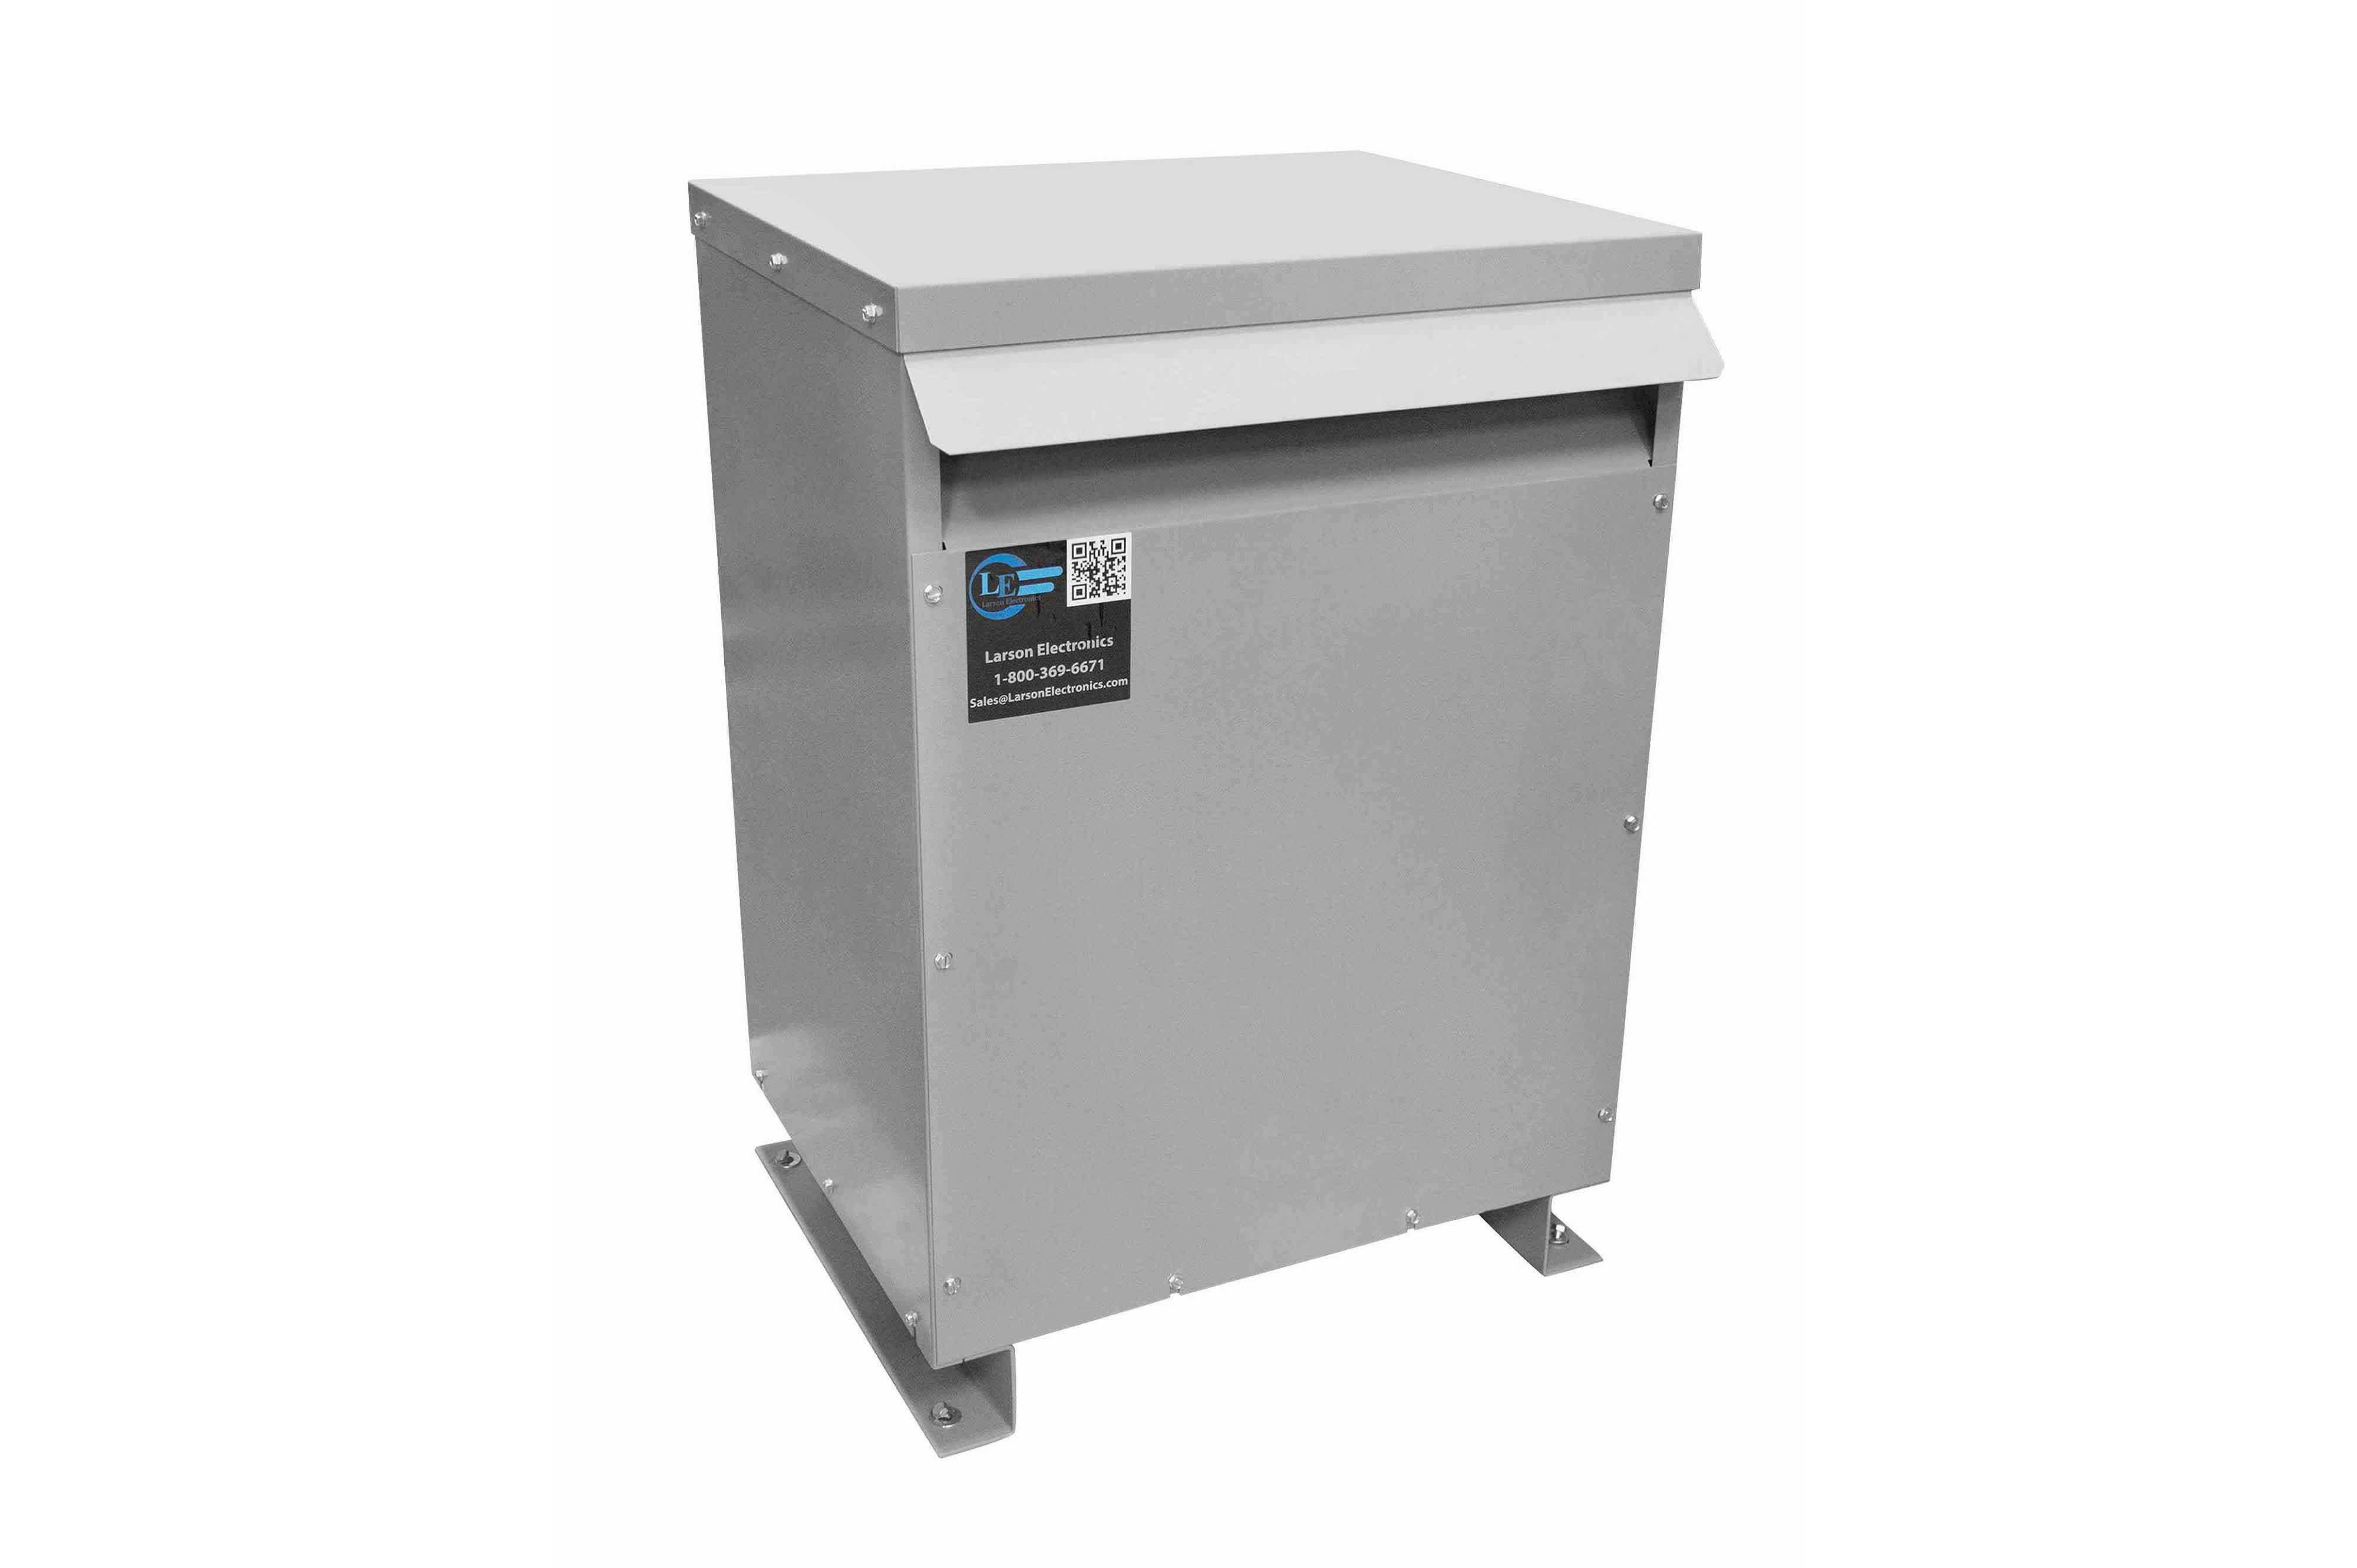 167 kVA 3PH Isolation Transformer, 240V Wye Primary, 208Y/120 Wye-N Secondary, N3R, Ventilated, 60 Hz